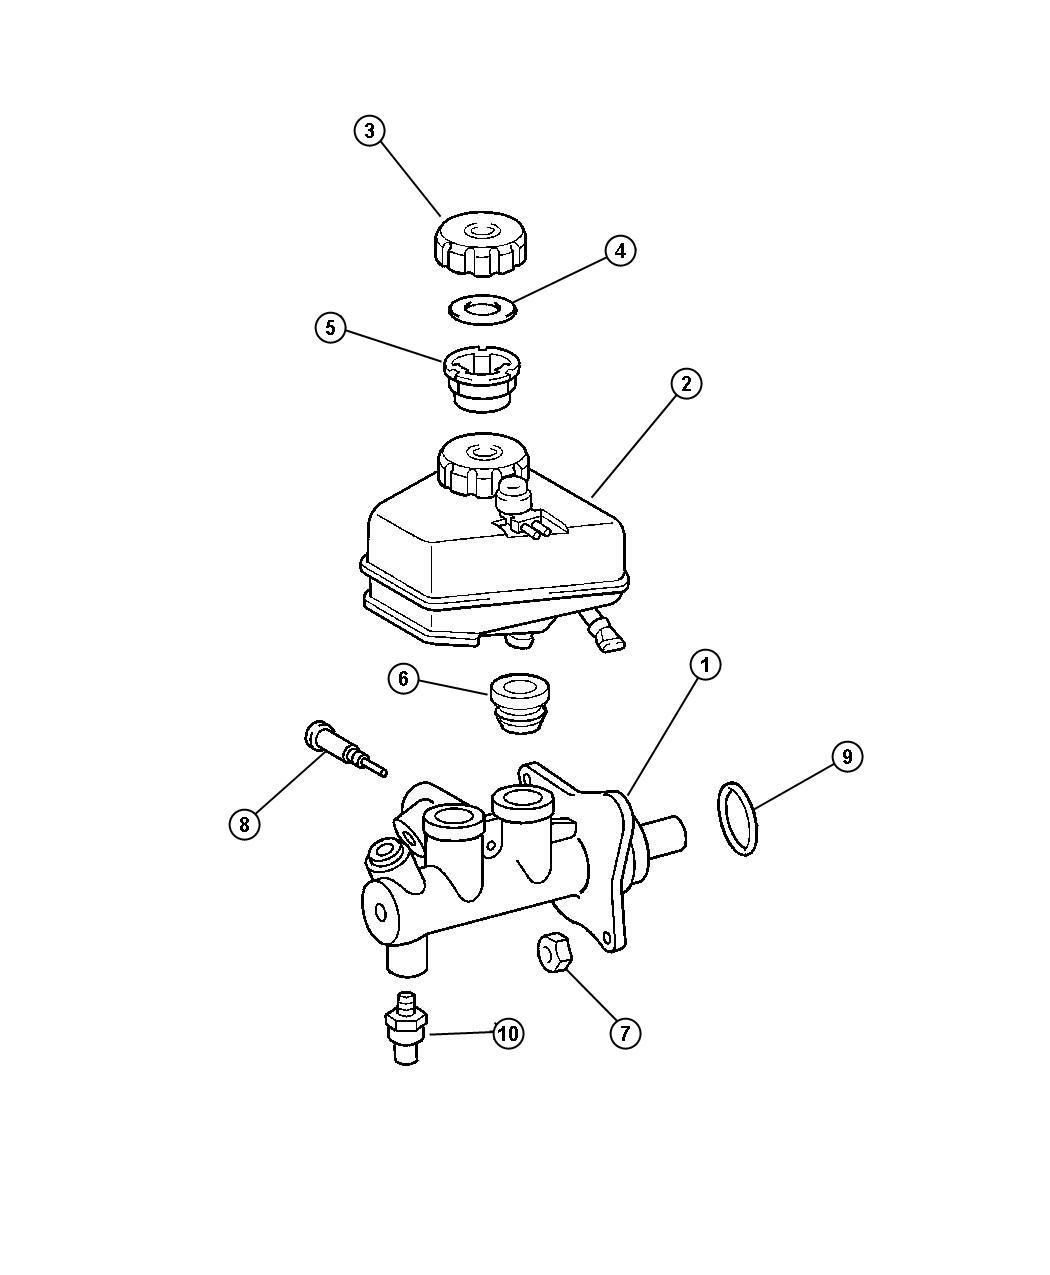 Chrysler Crossfire Sensor. Anti-lock brakes, pressure